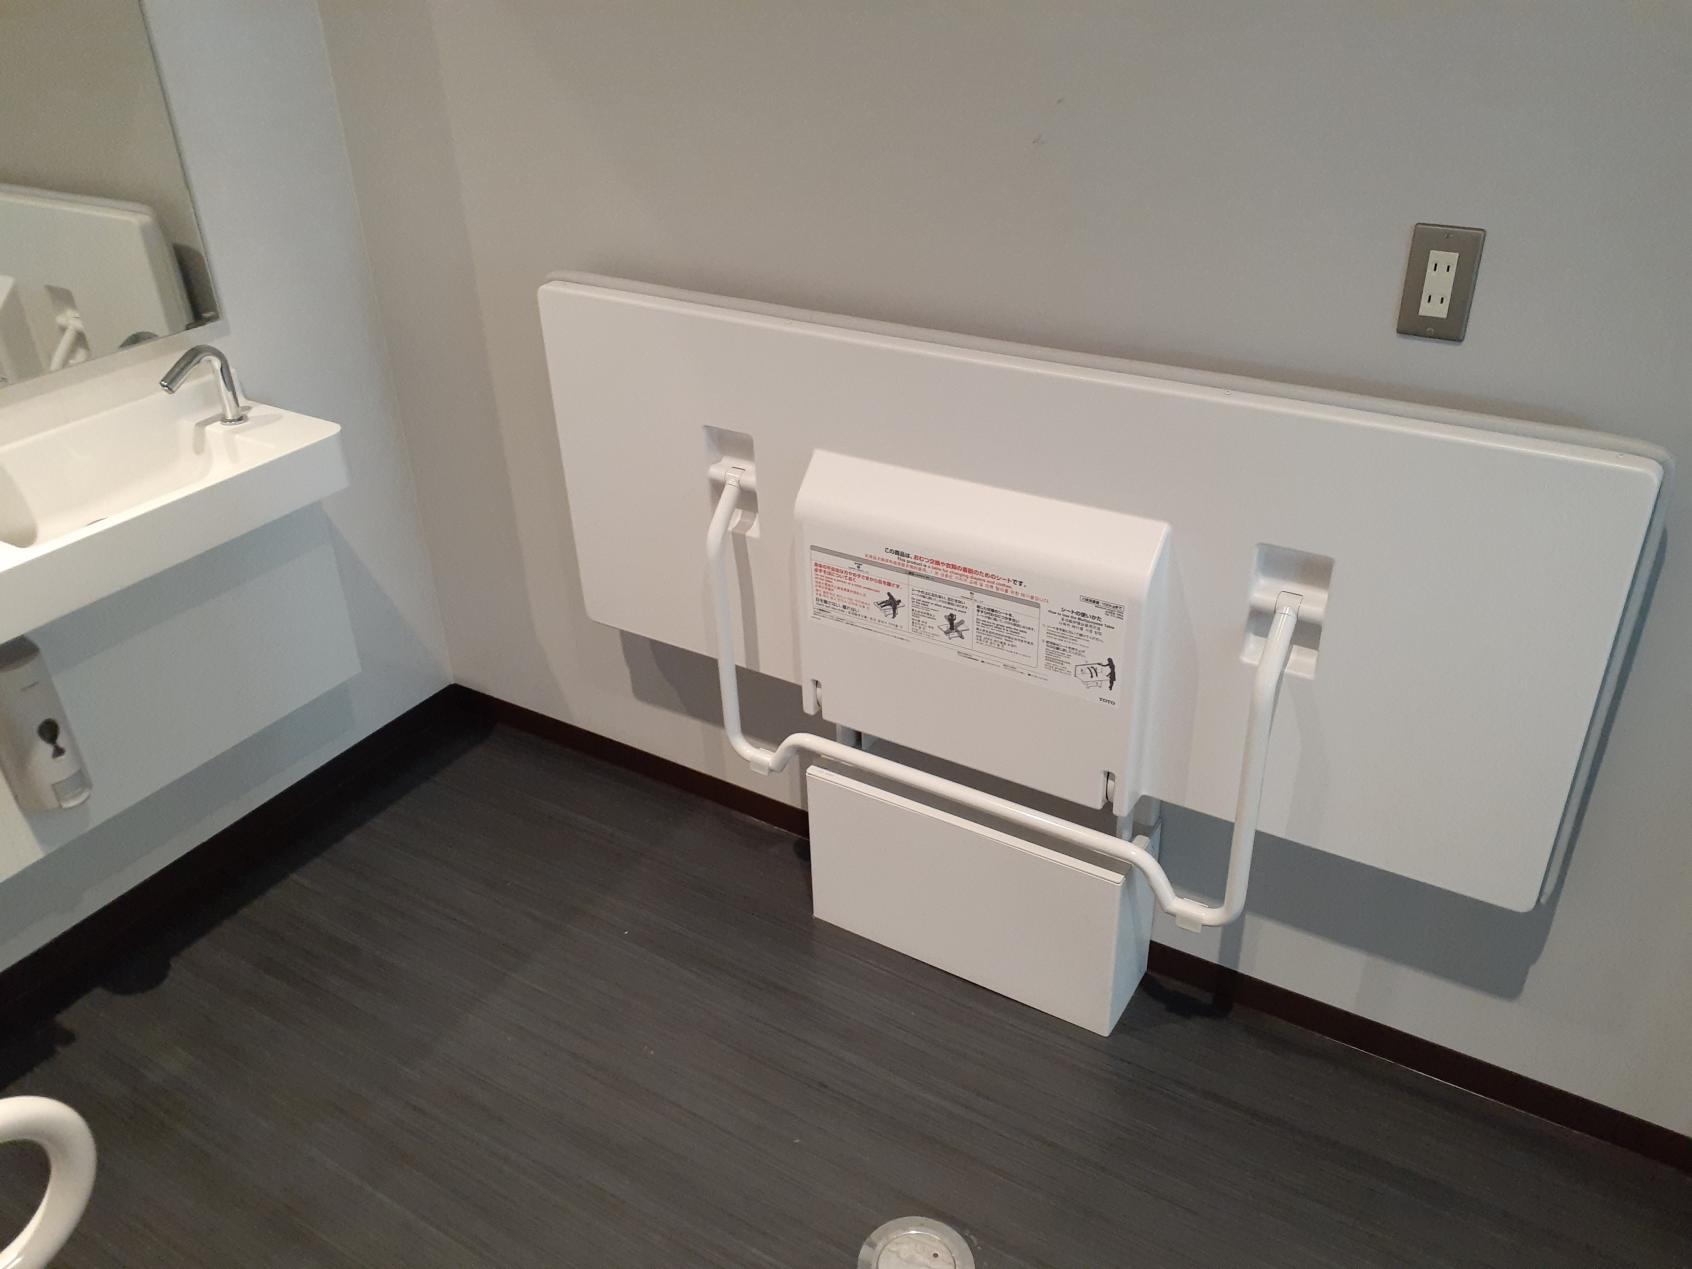 山頂駅 多目的トイレ内部②-6